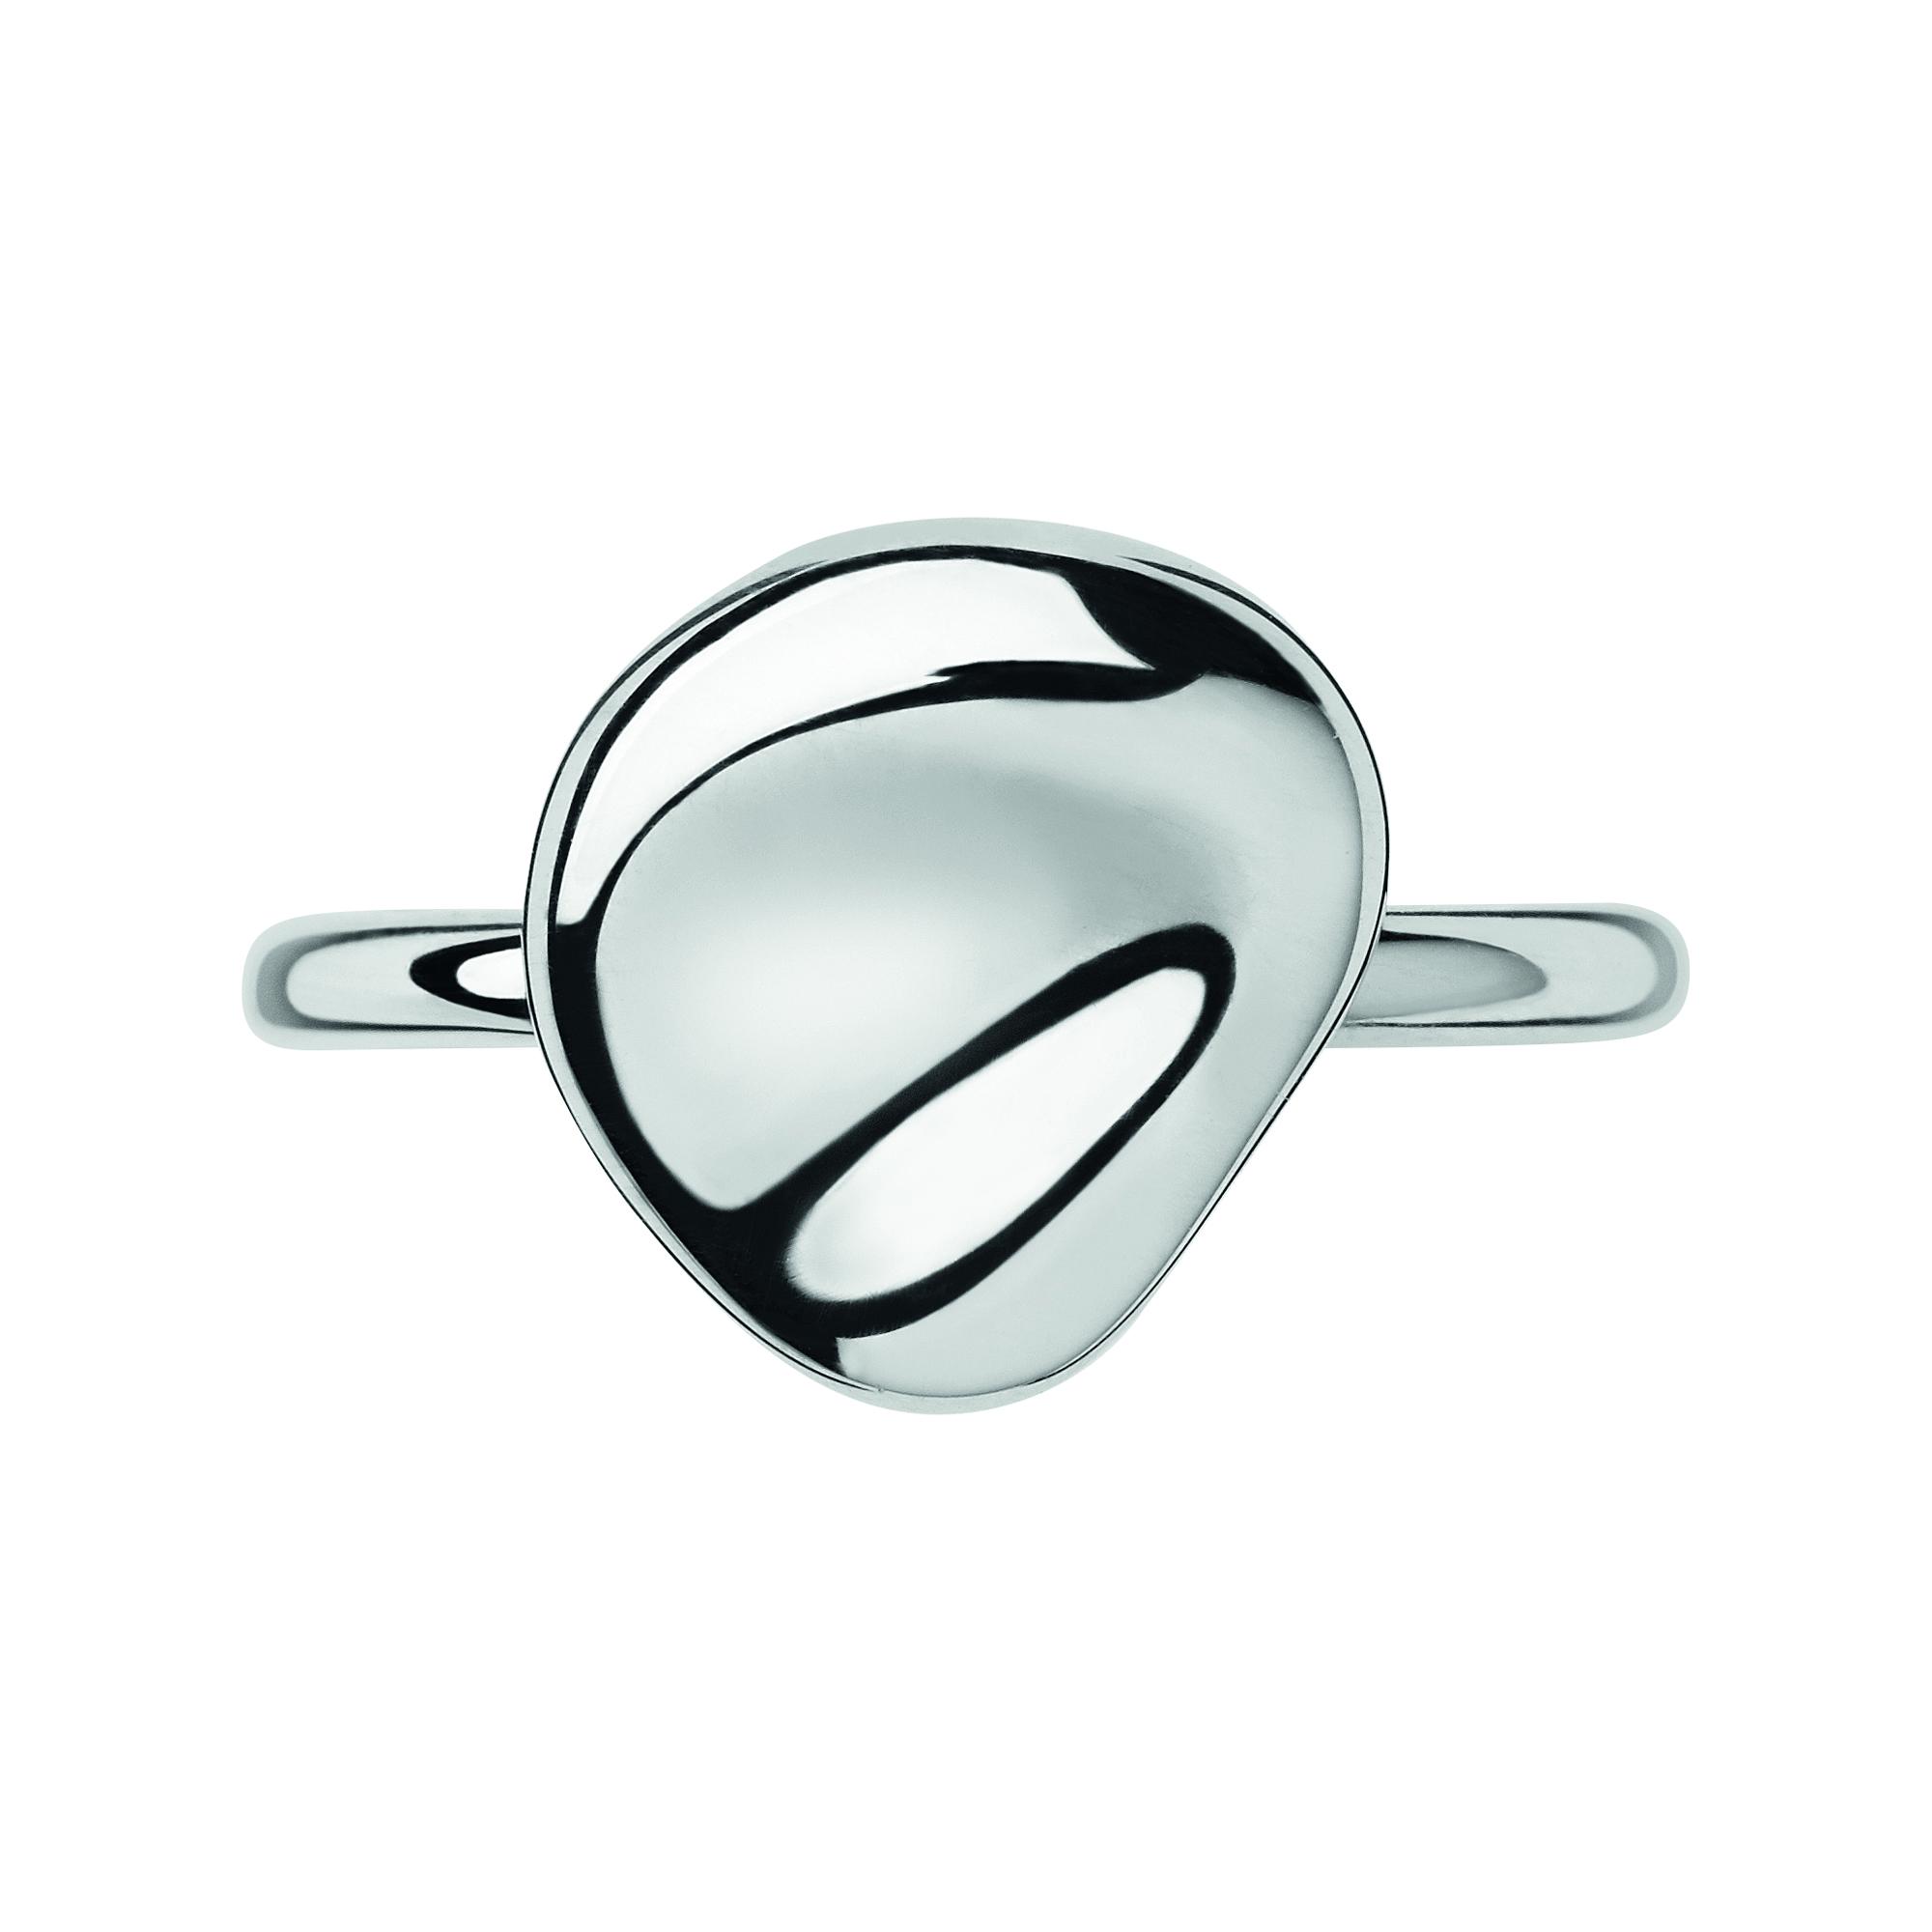 LINKS OF LONDON - Ασημένιο δαχτυλίδι Pebbles -μέγεθος 56